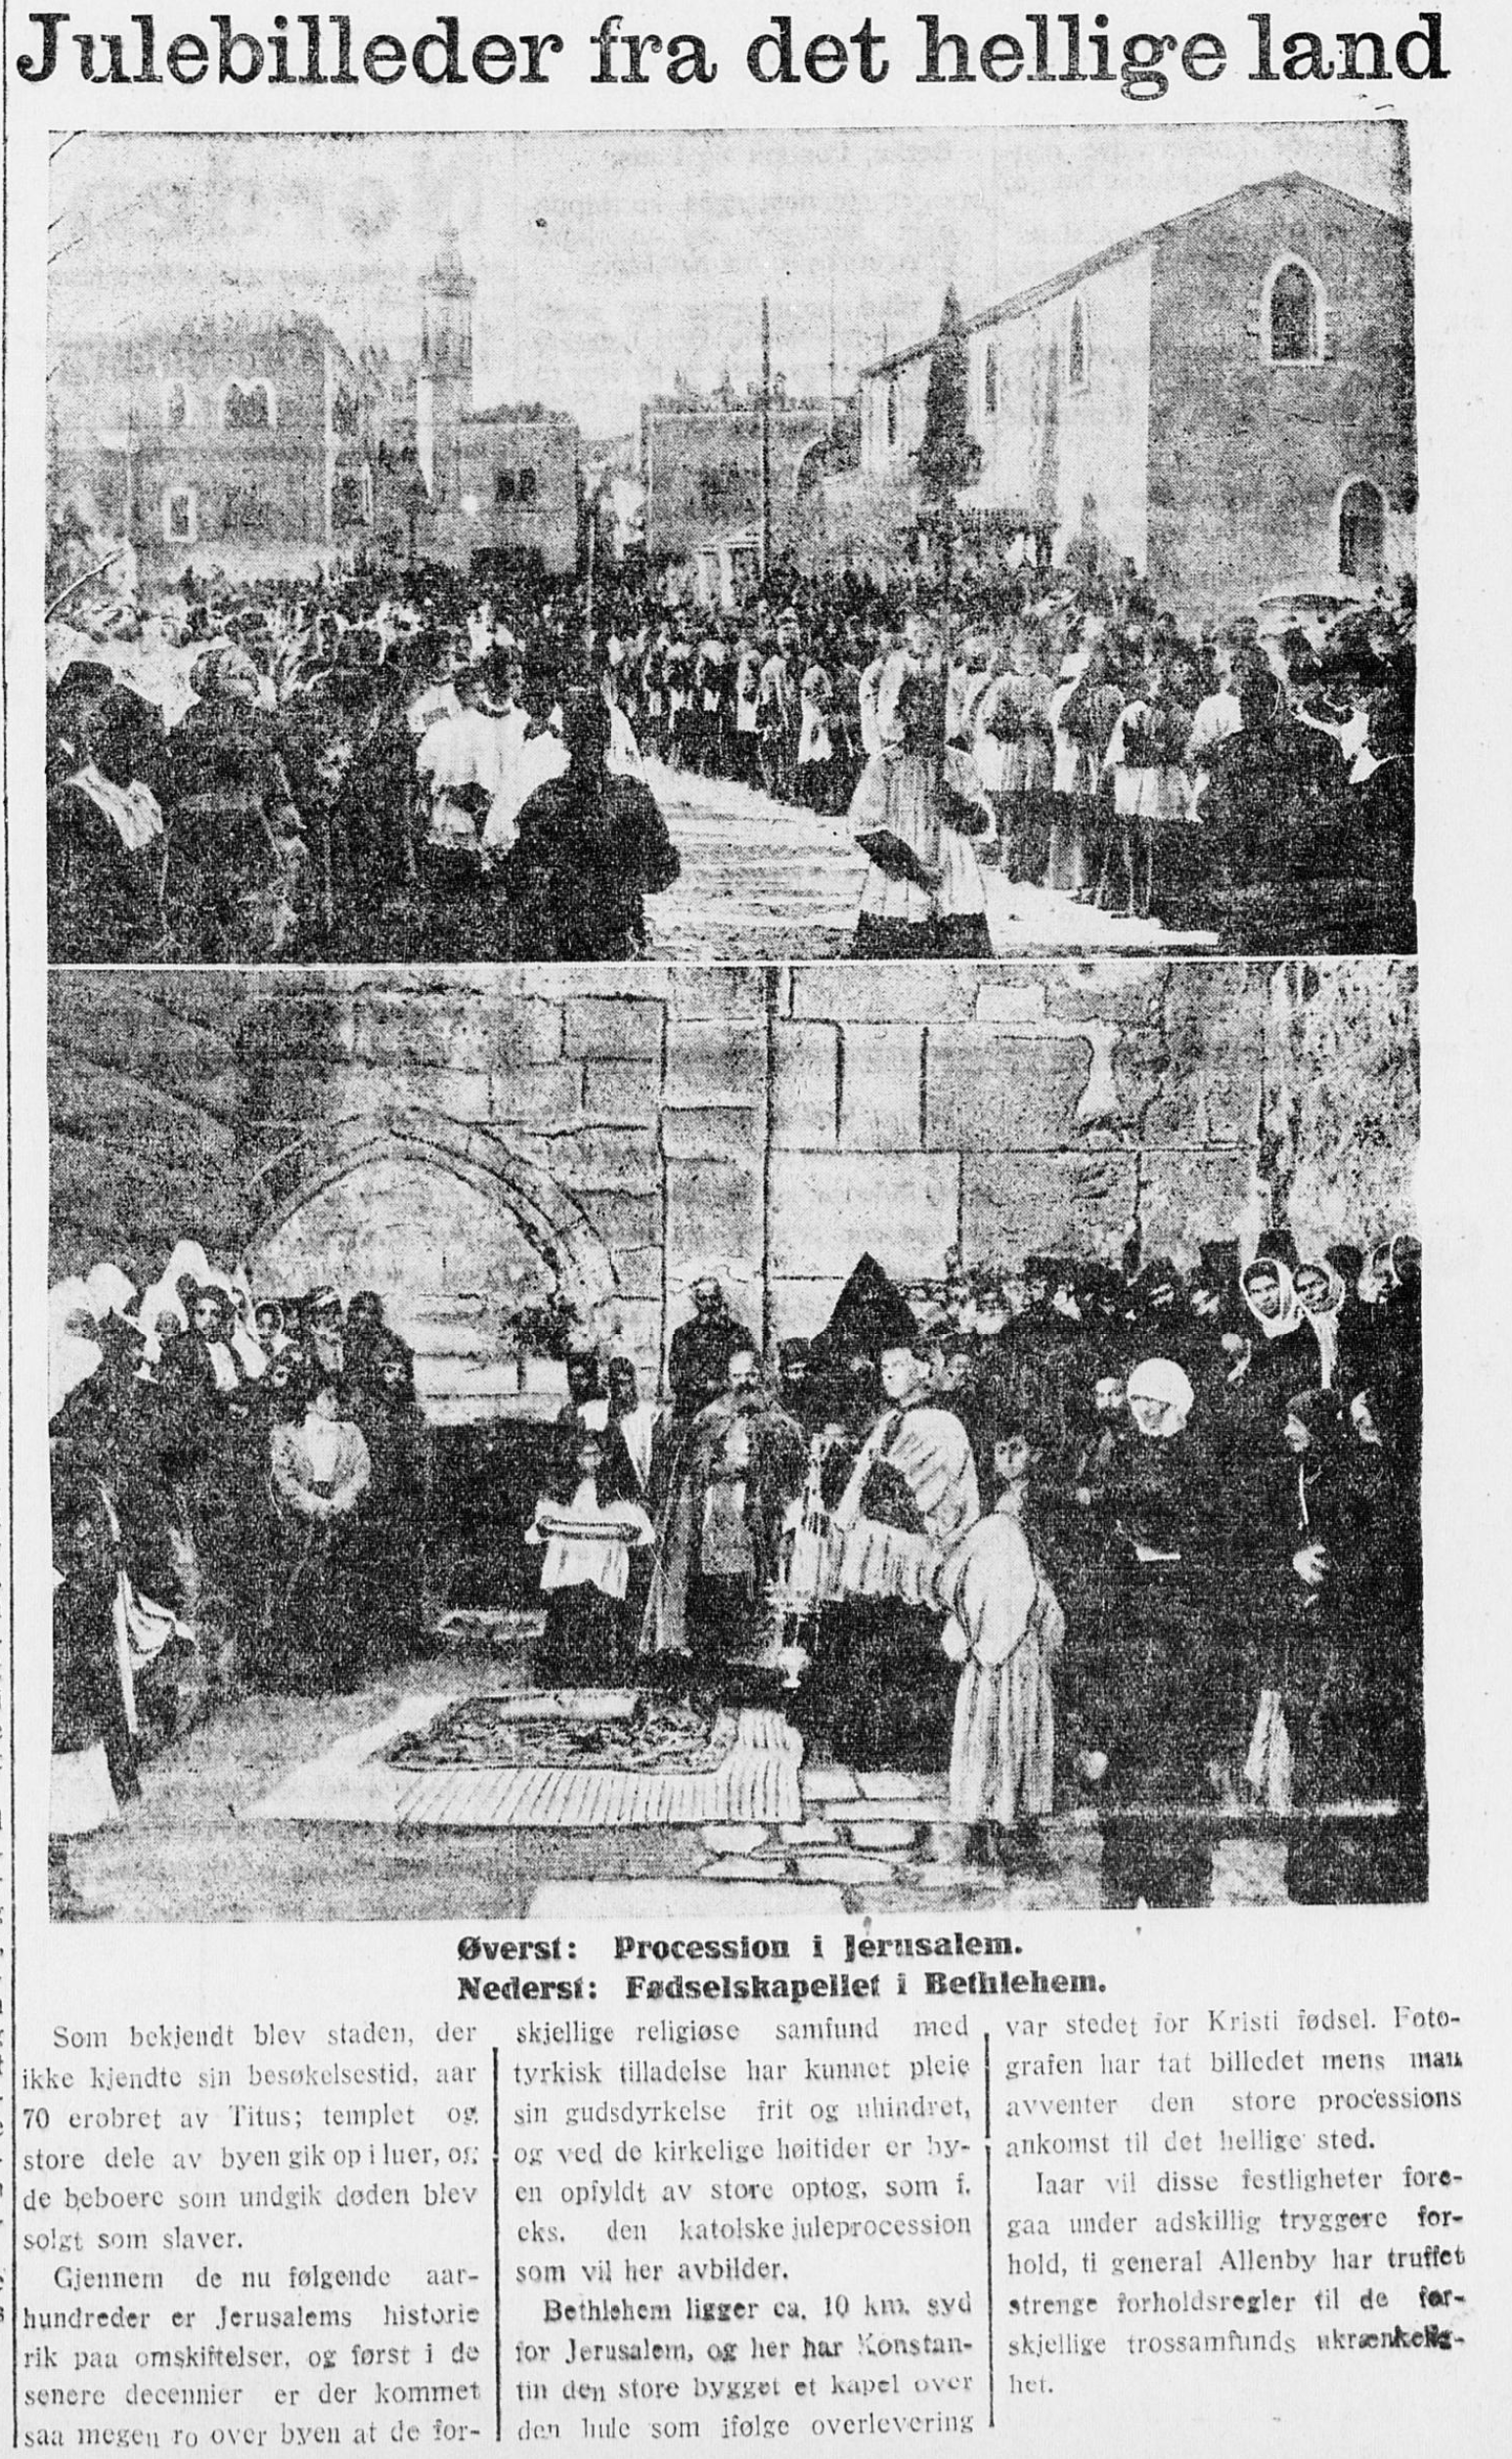 På sjølvaste Julafta 1917 kunne  Trondhjems Adresseavis  by på julebilete frå det heilage land, der dei la til at «disse festligheter [vil] foregaa under adskillig tryggere forhold» no som Allenby styrte.